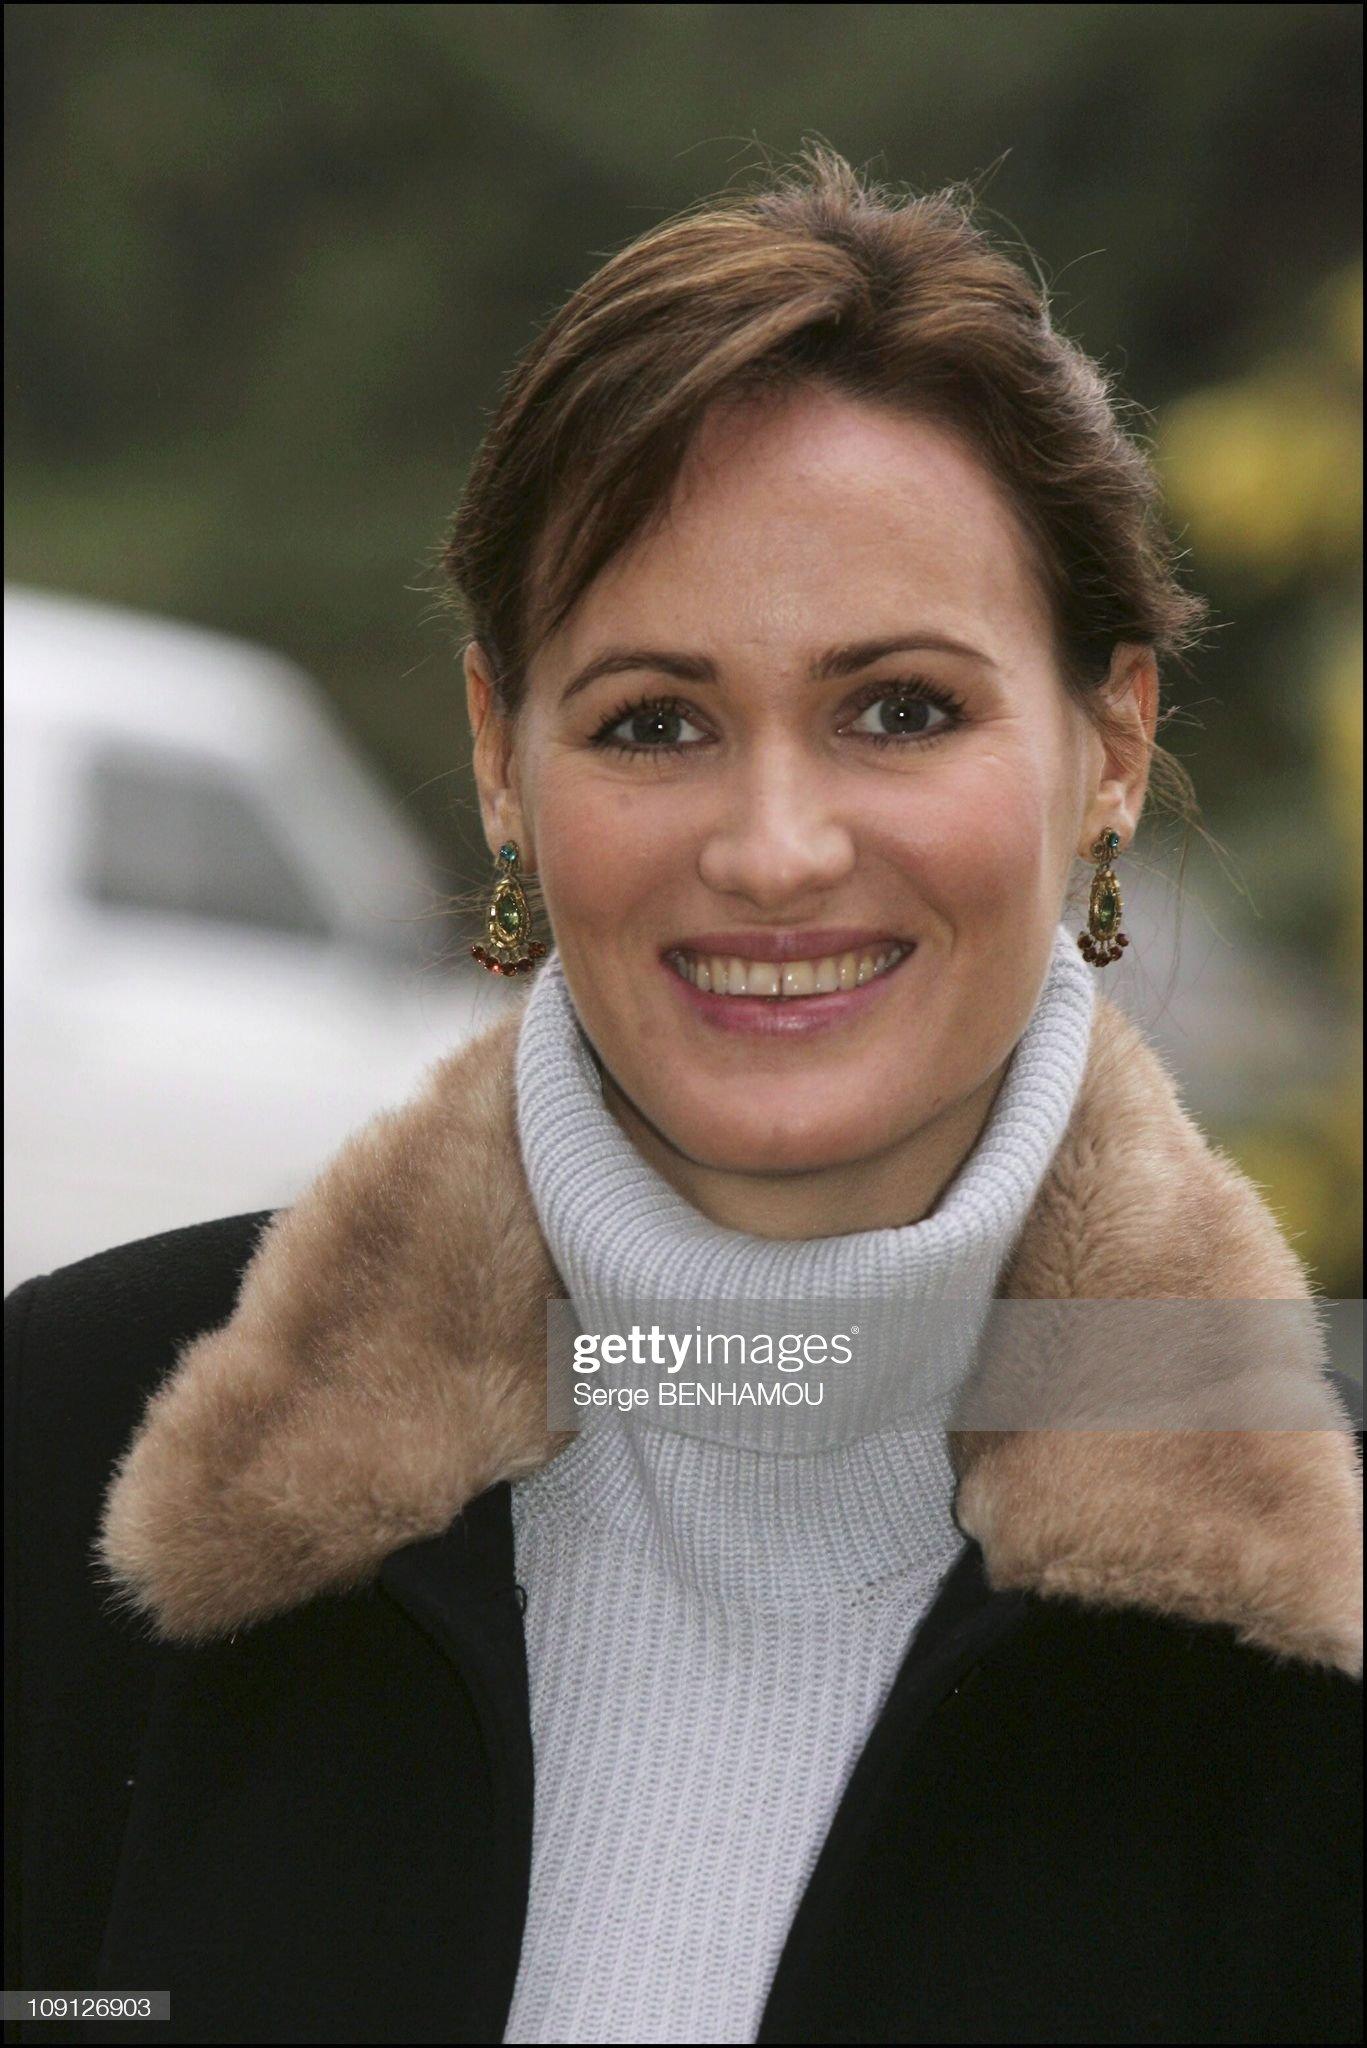 kiki   - ajonc  22 juin  Bravo Martine   Photocall-judith-godreche-in-sarlat-on-november-10-2004-in-sarlat-picture-id109126903?s=2048x2048